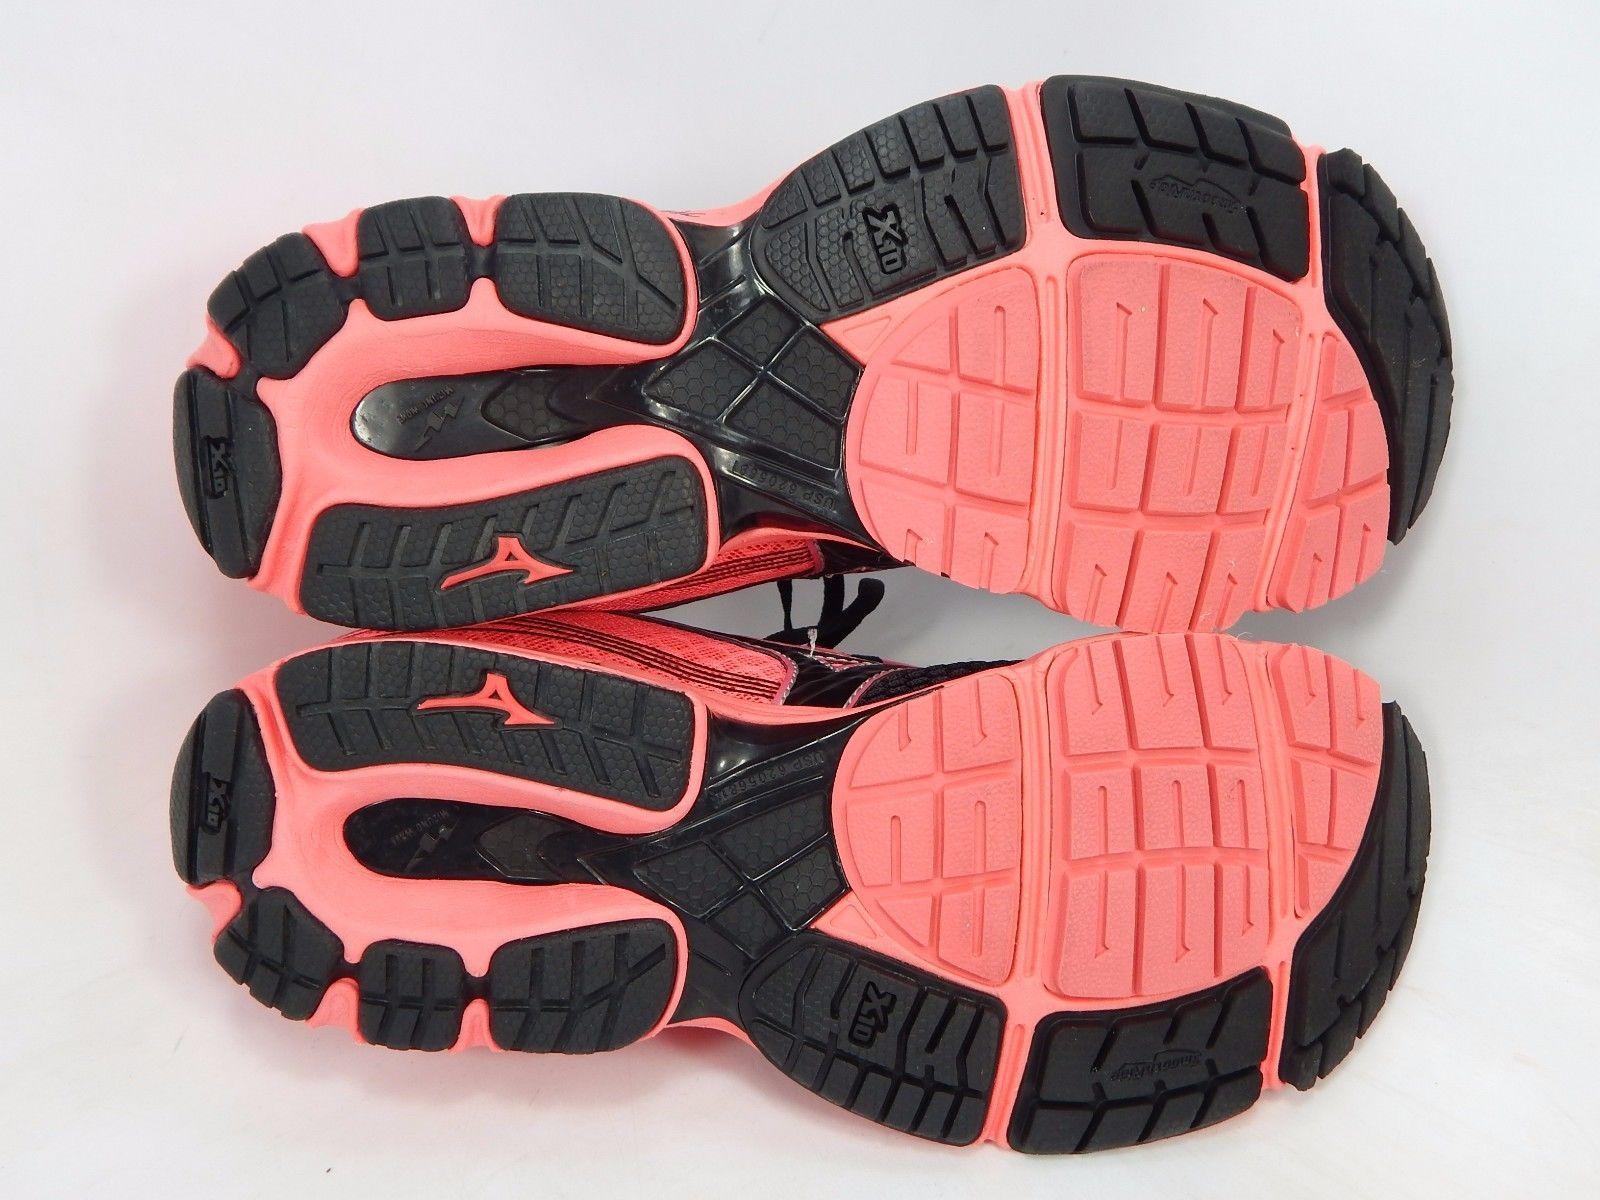 Mizuno Wave Sayonara 3 Women's Running Shoes Size US 8 M (B) EU 38.5 Black Pink